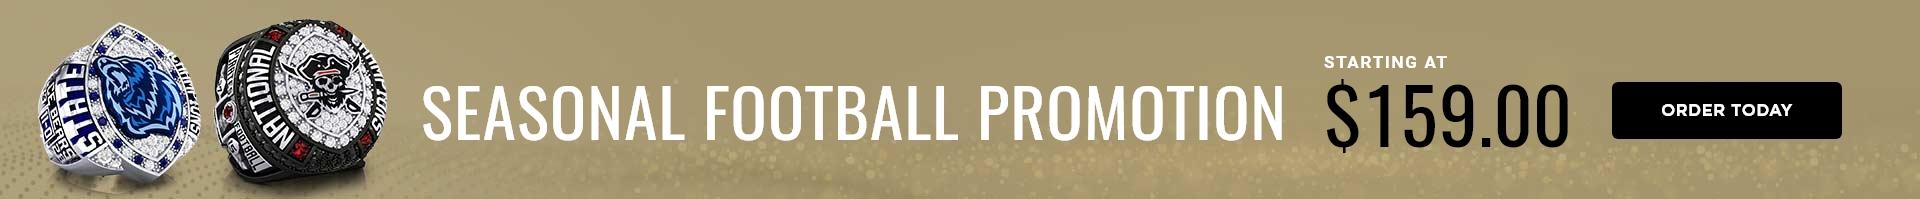 Baron Championship Rings Fall Football Promo